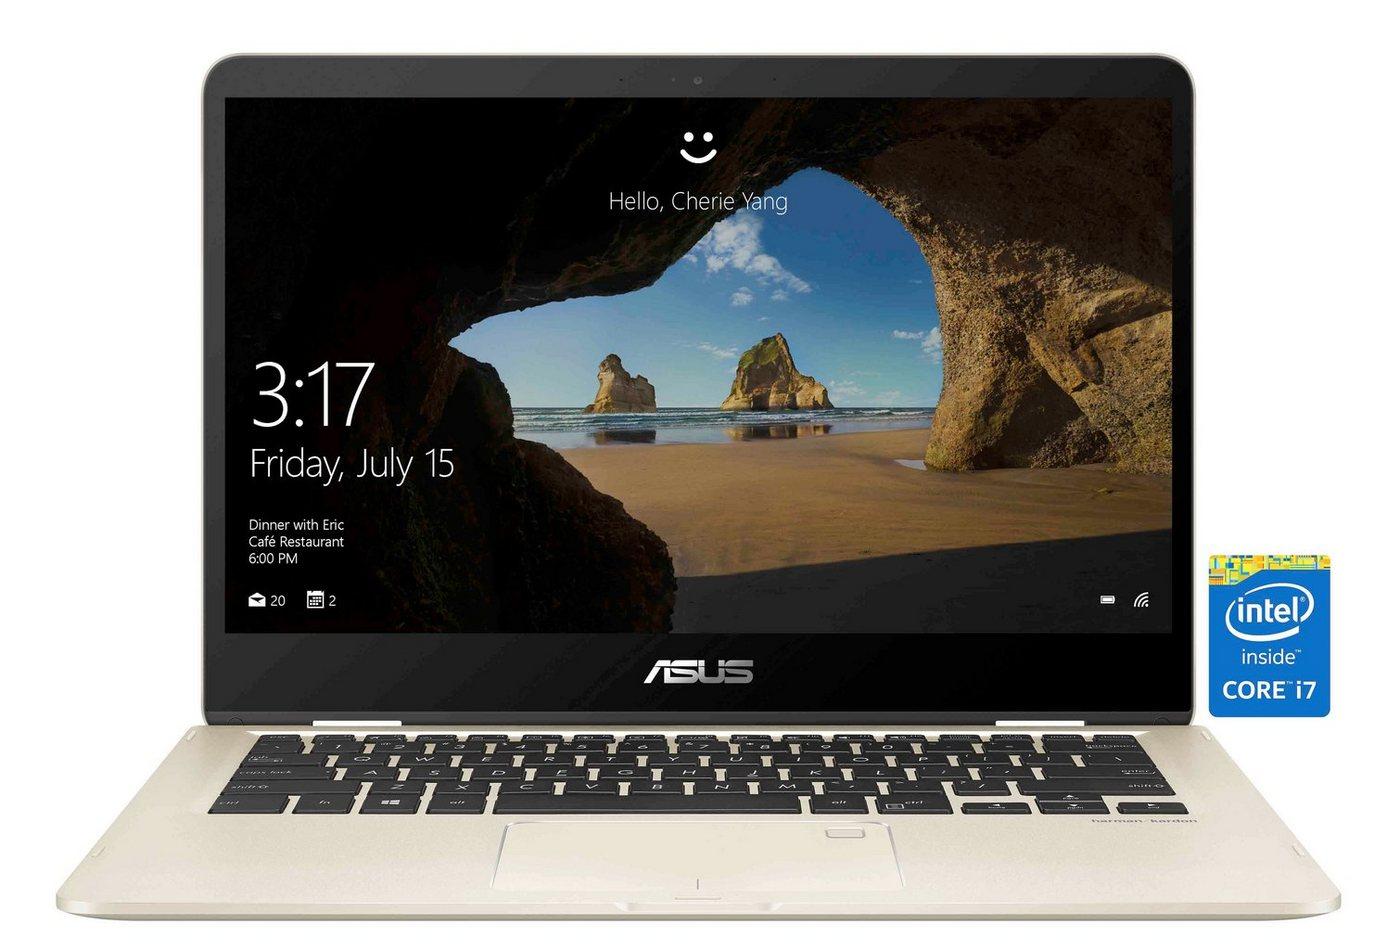 Asus Notebook »ZENBOOK FLIP 14 I7-8550U 14IN« - Preisvergleich